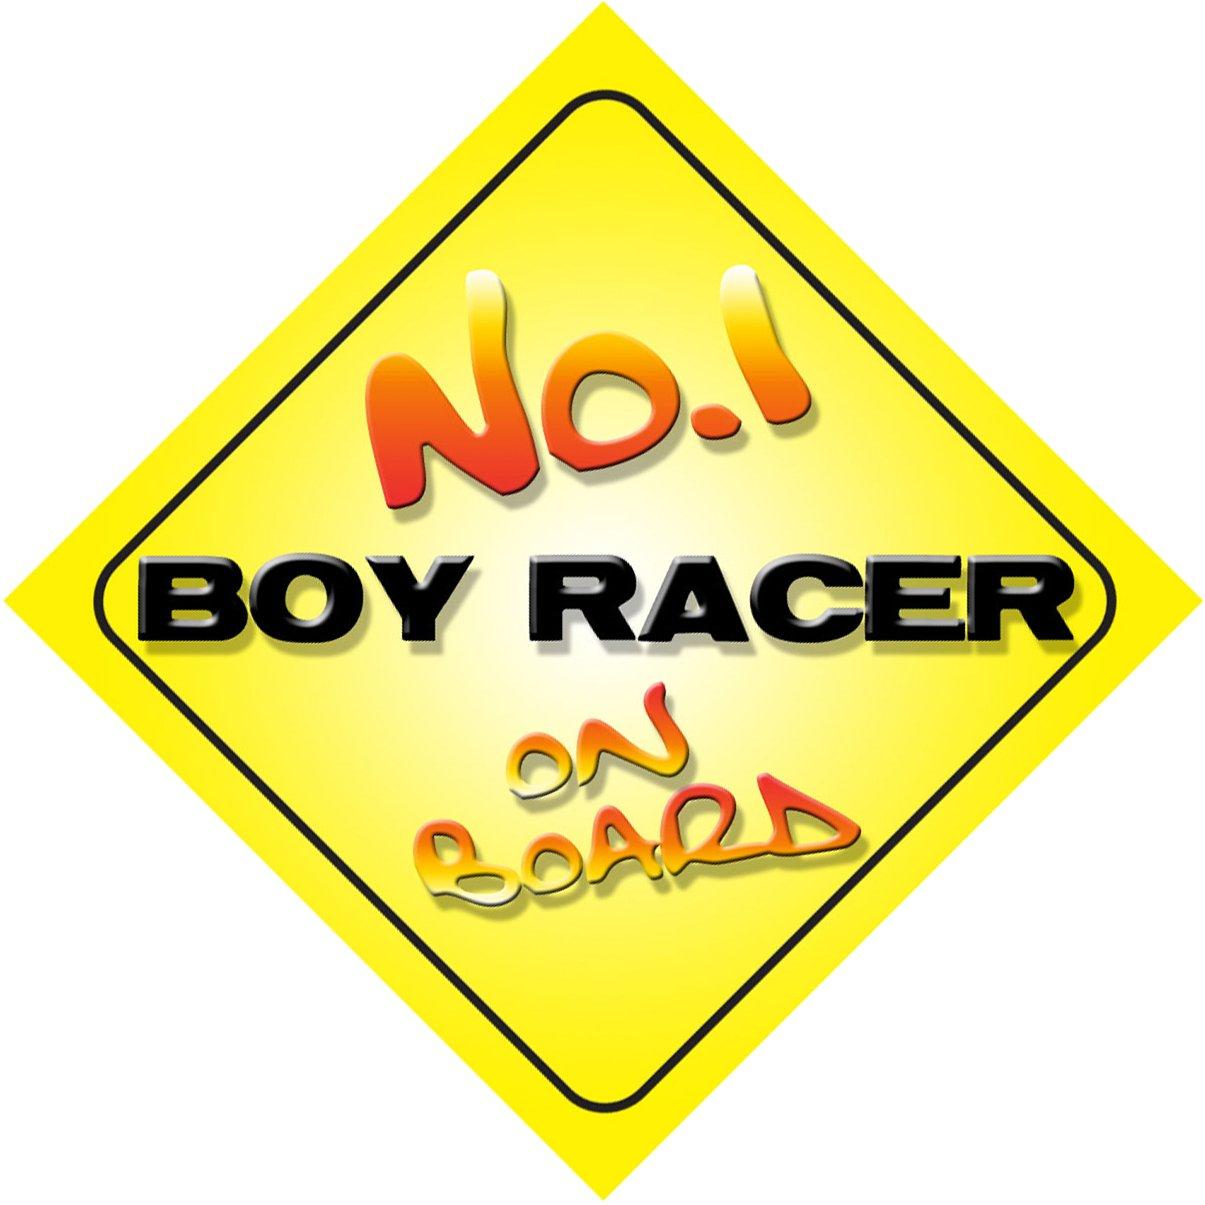 No.1 Boy Racer on Board Novelty Car Sign New Job / Promotion / Novelty Gift / Present Quality Goods Ltd